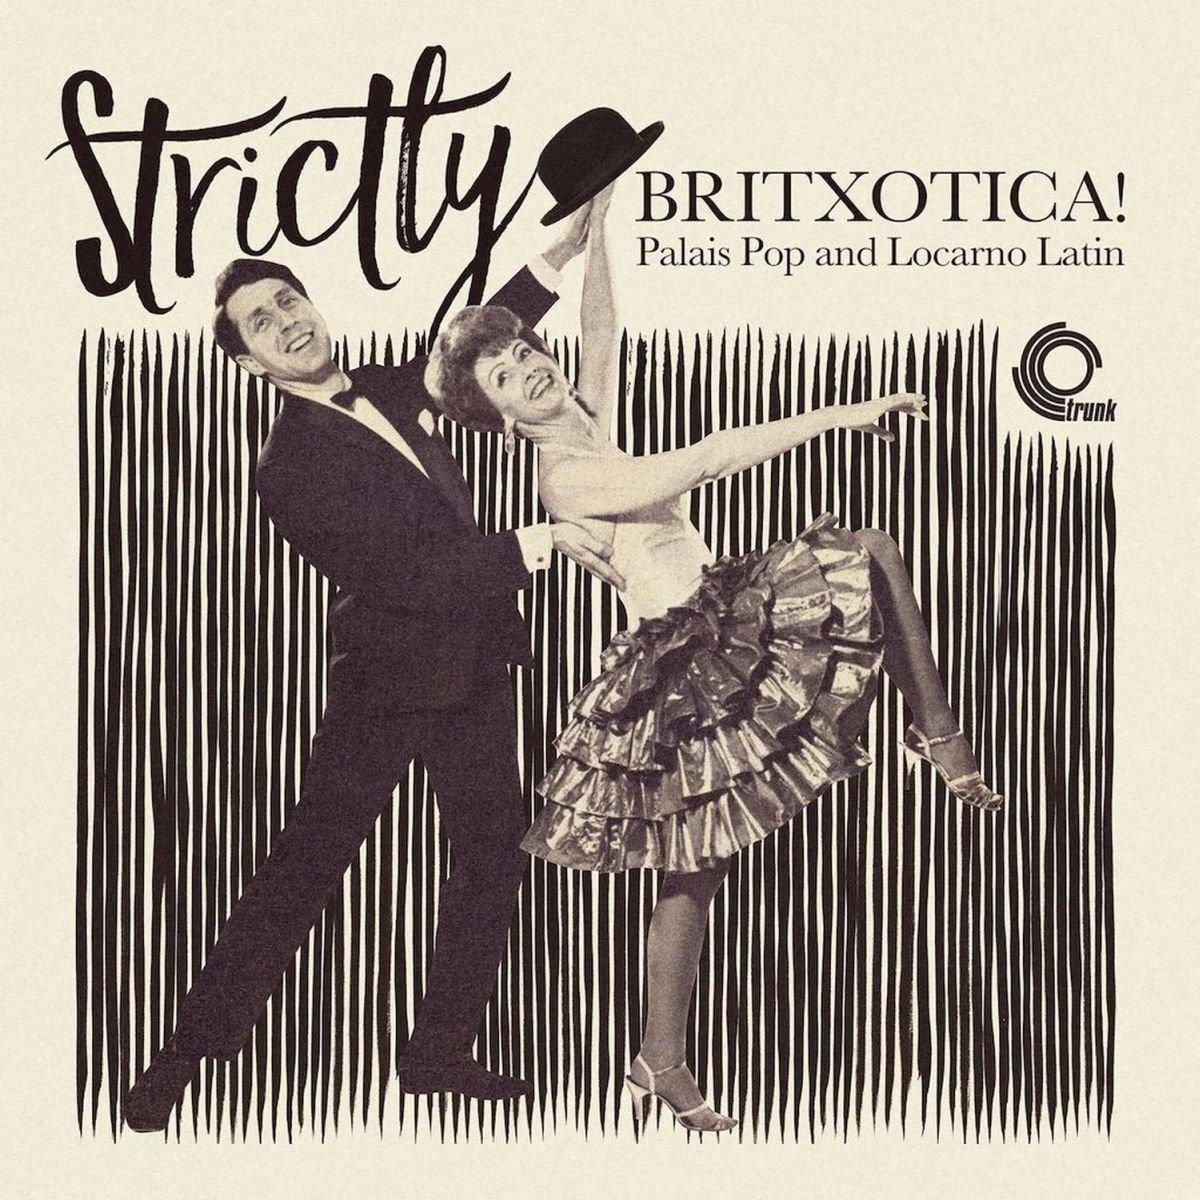 Sale special price Strictly Britxotica: Palais Locarno Pop Var Time sale